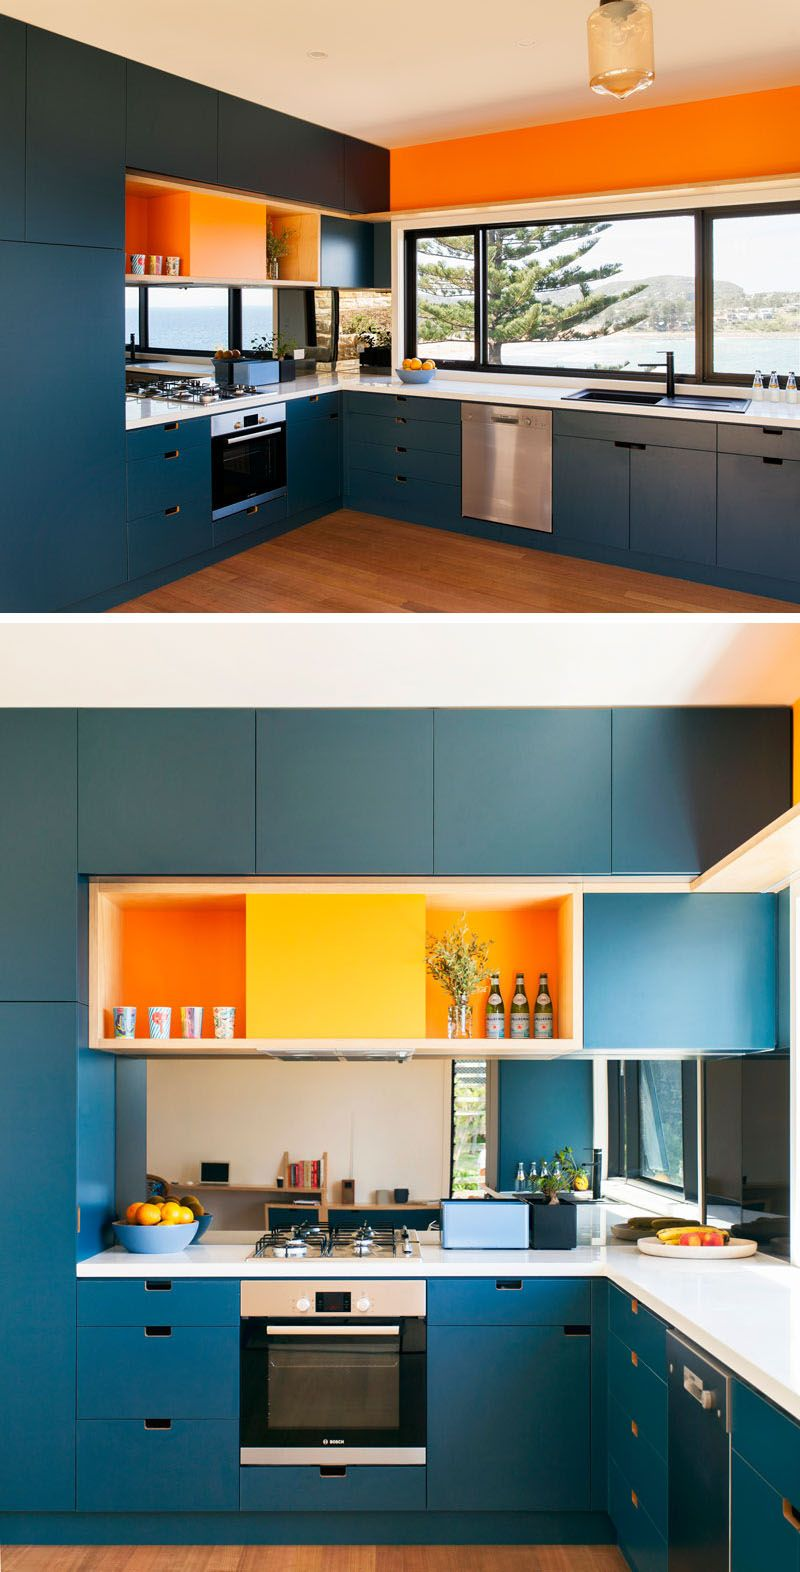 This Prefab House With A Lush Green Roof Was Built In Six Weeks Blue Kitchen Decor Modern Kitchen Design Modern Kitchen